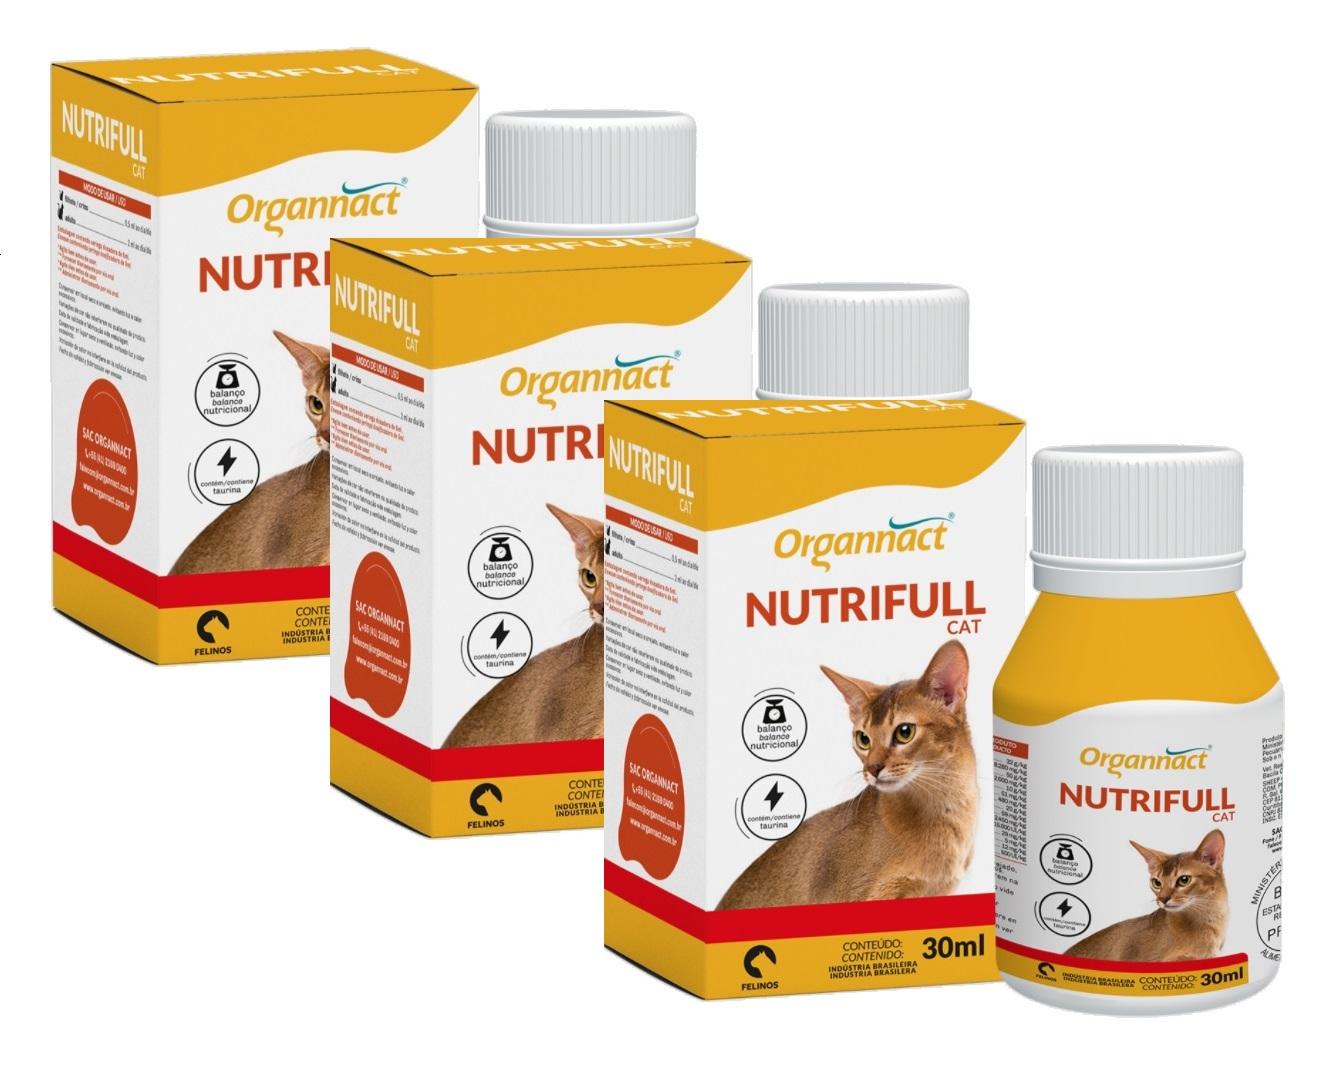 Kit 3 Unidades Nutrifull Cat 30ml - Organnact